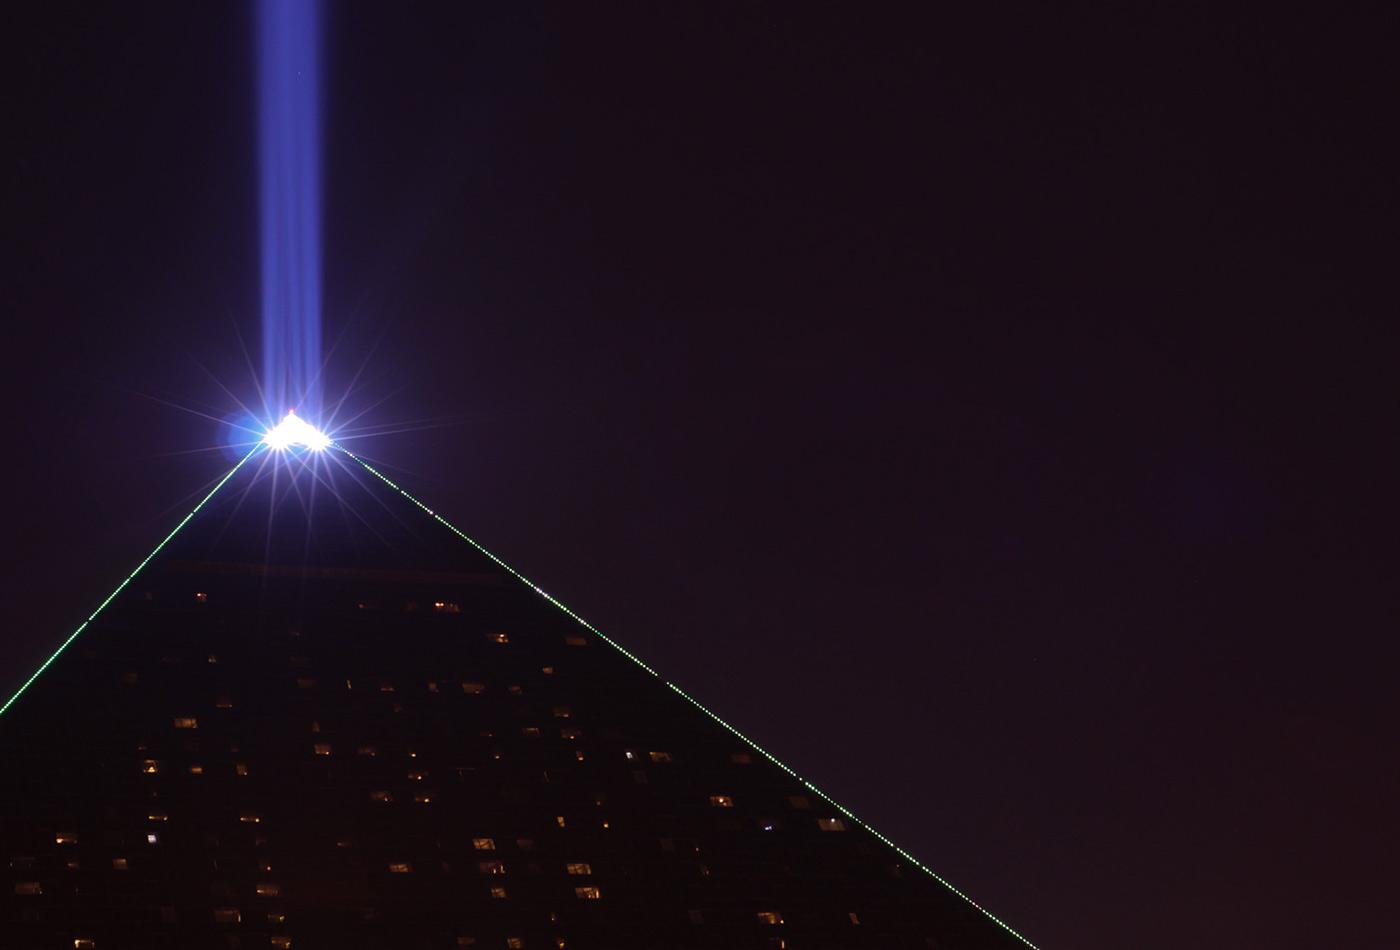 Light beam, Luxor, Las Vegas.